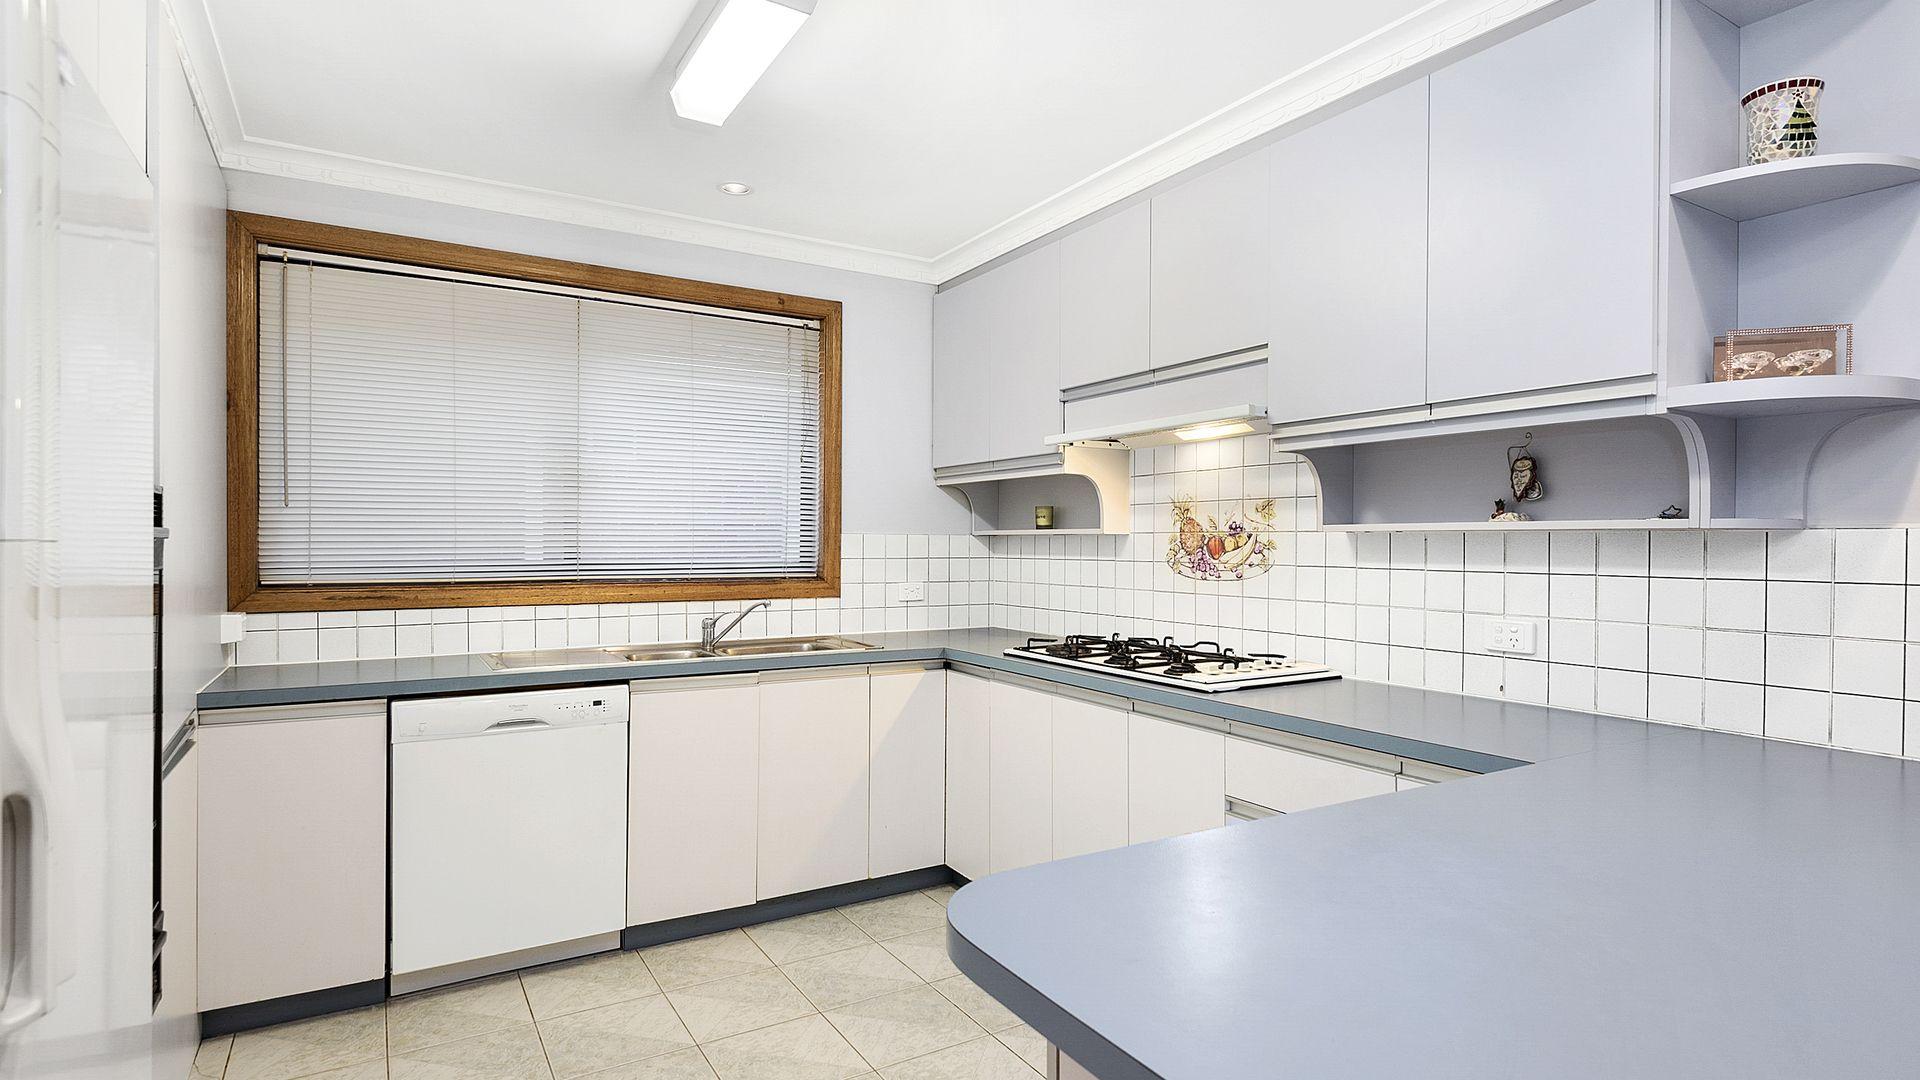 33 Georgette Crescent, Endeavour Hills VIC 3802, Image 2